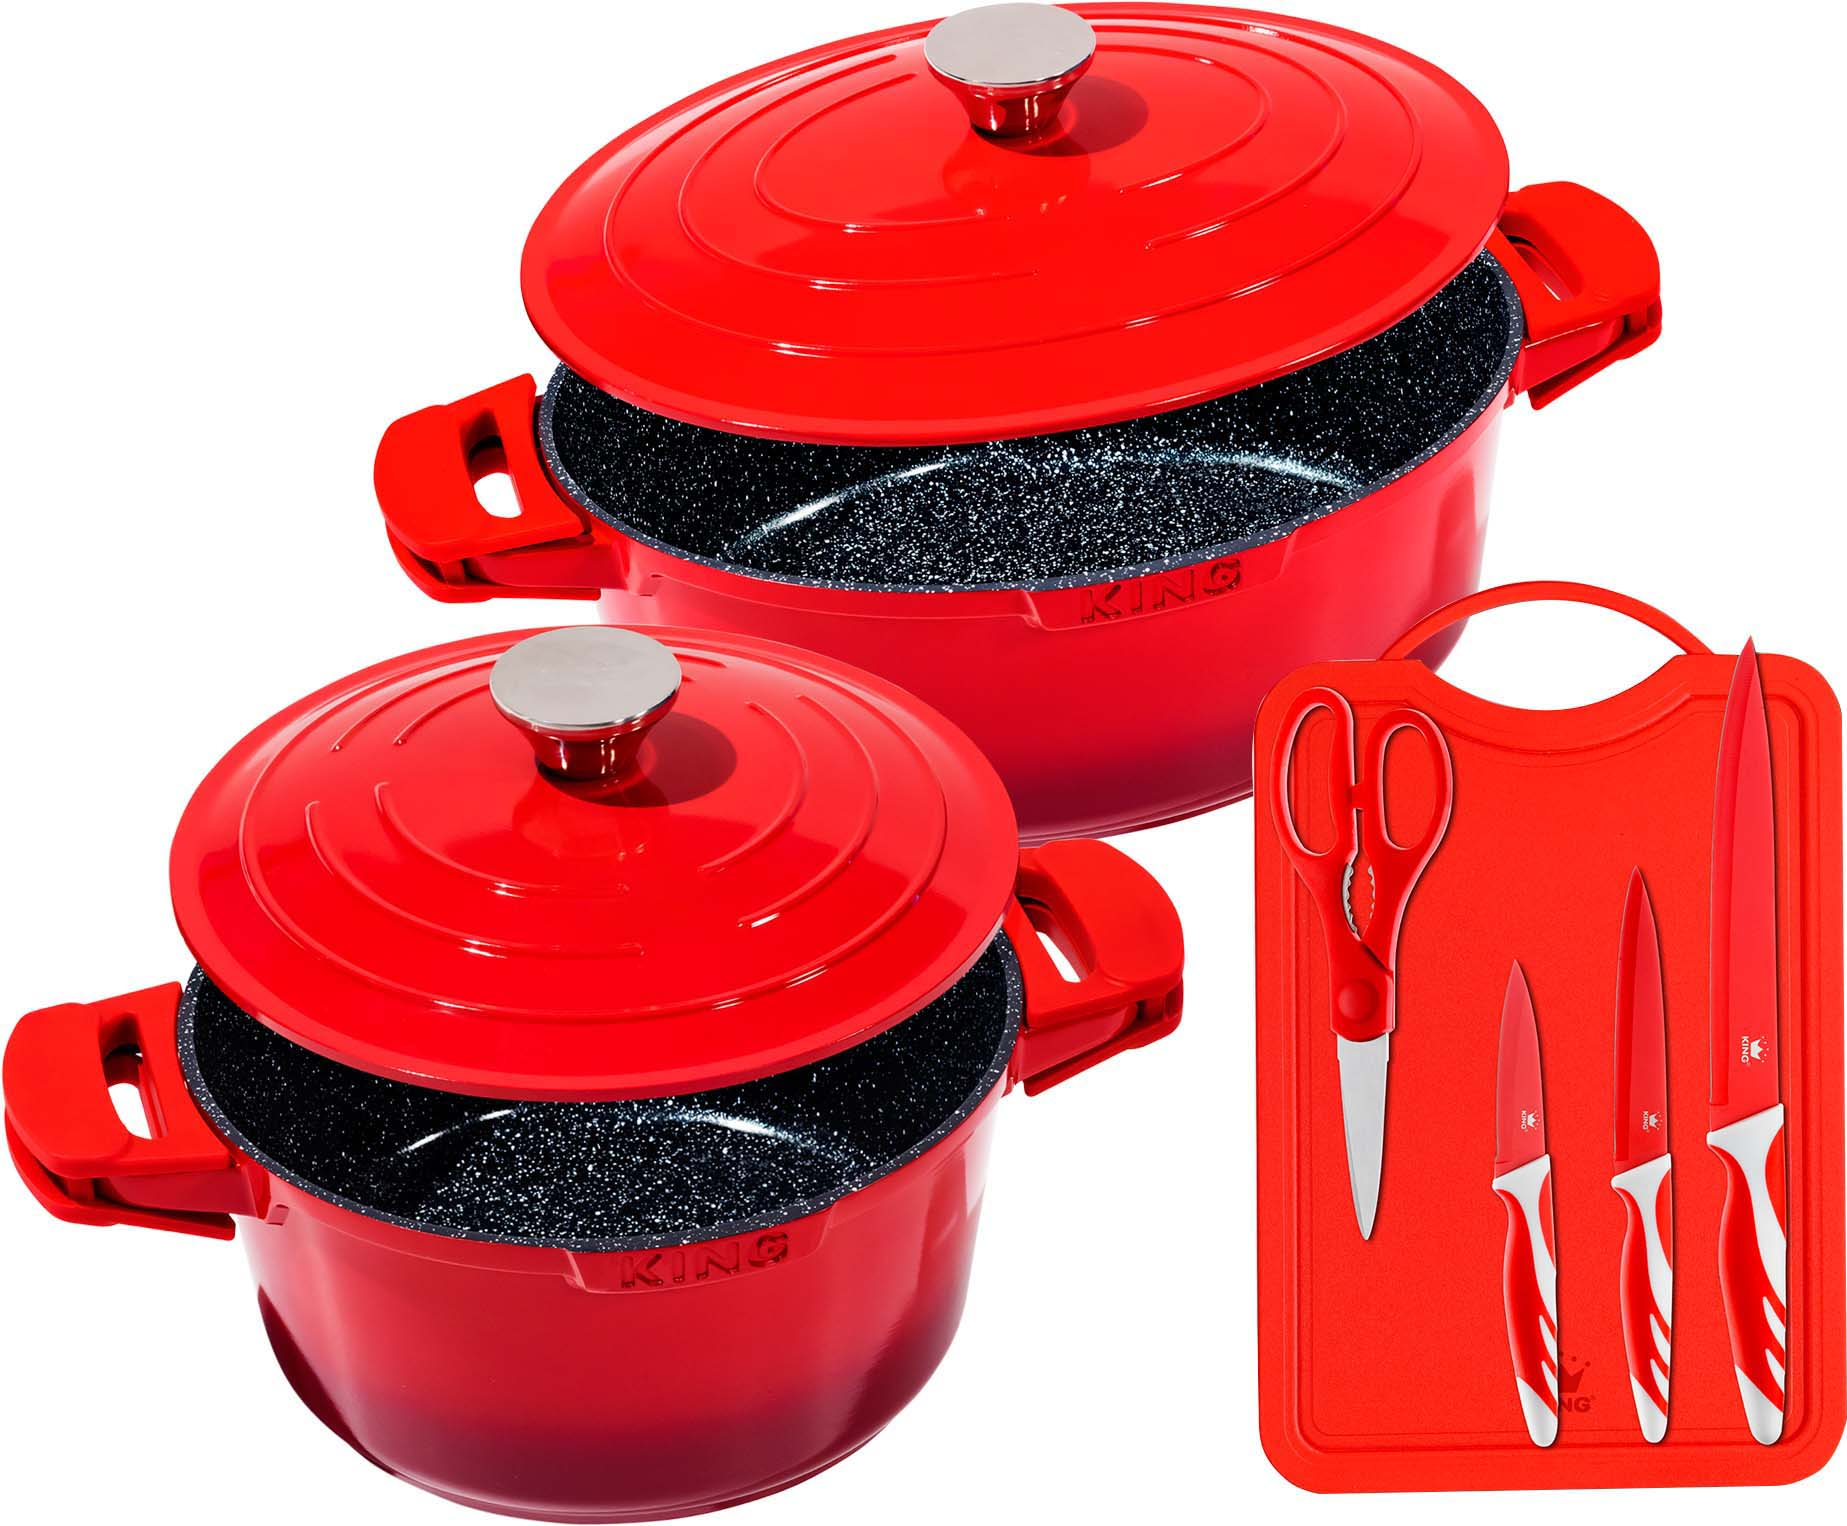 KING Topf-Set Shine (Set, 7-tlg., 2 Töpfe, Schneidbrett, Messer-Set) rot Topfsets Töpfe Haushaltswaren Topf